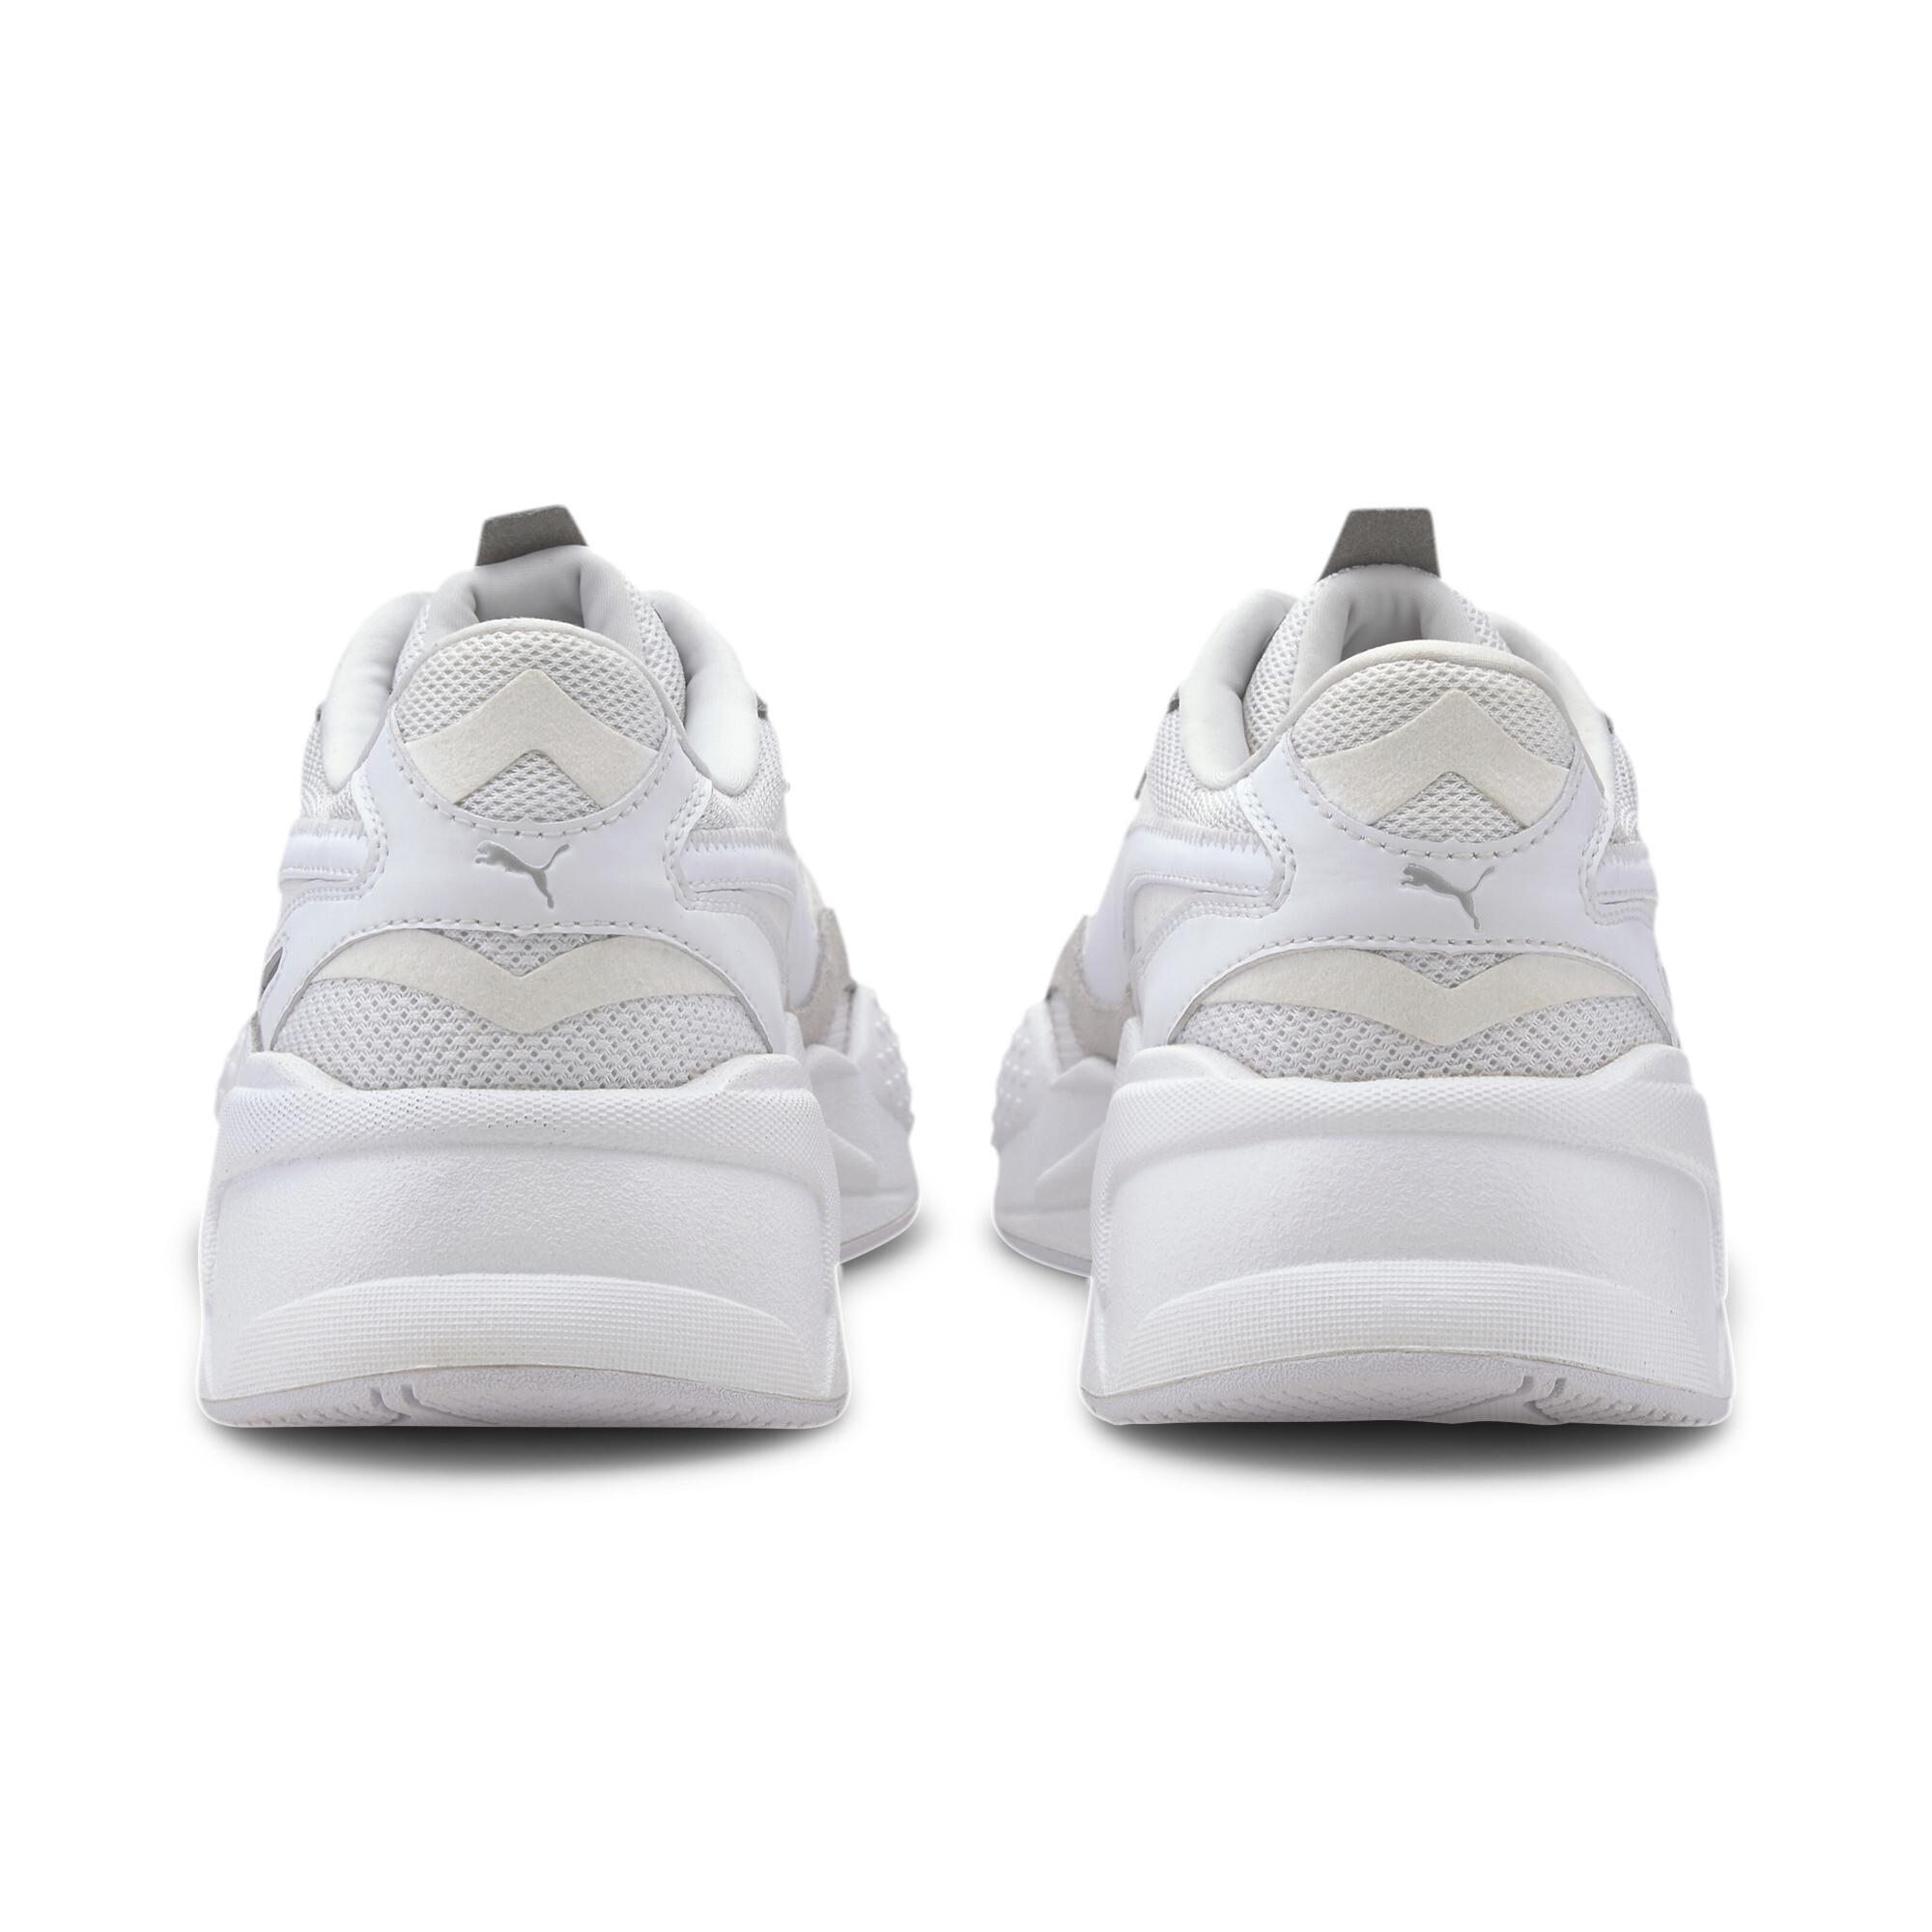 PUMA-Men-039-s-RS-X-Puzzle-Sneakers thumbnail 16